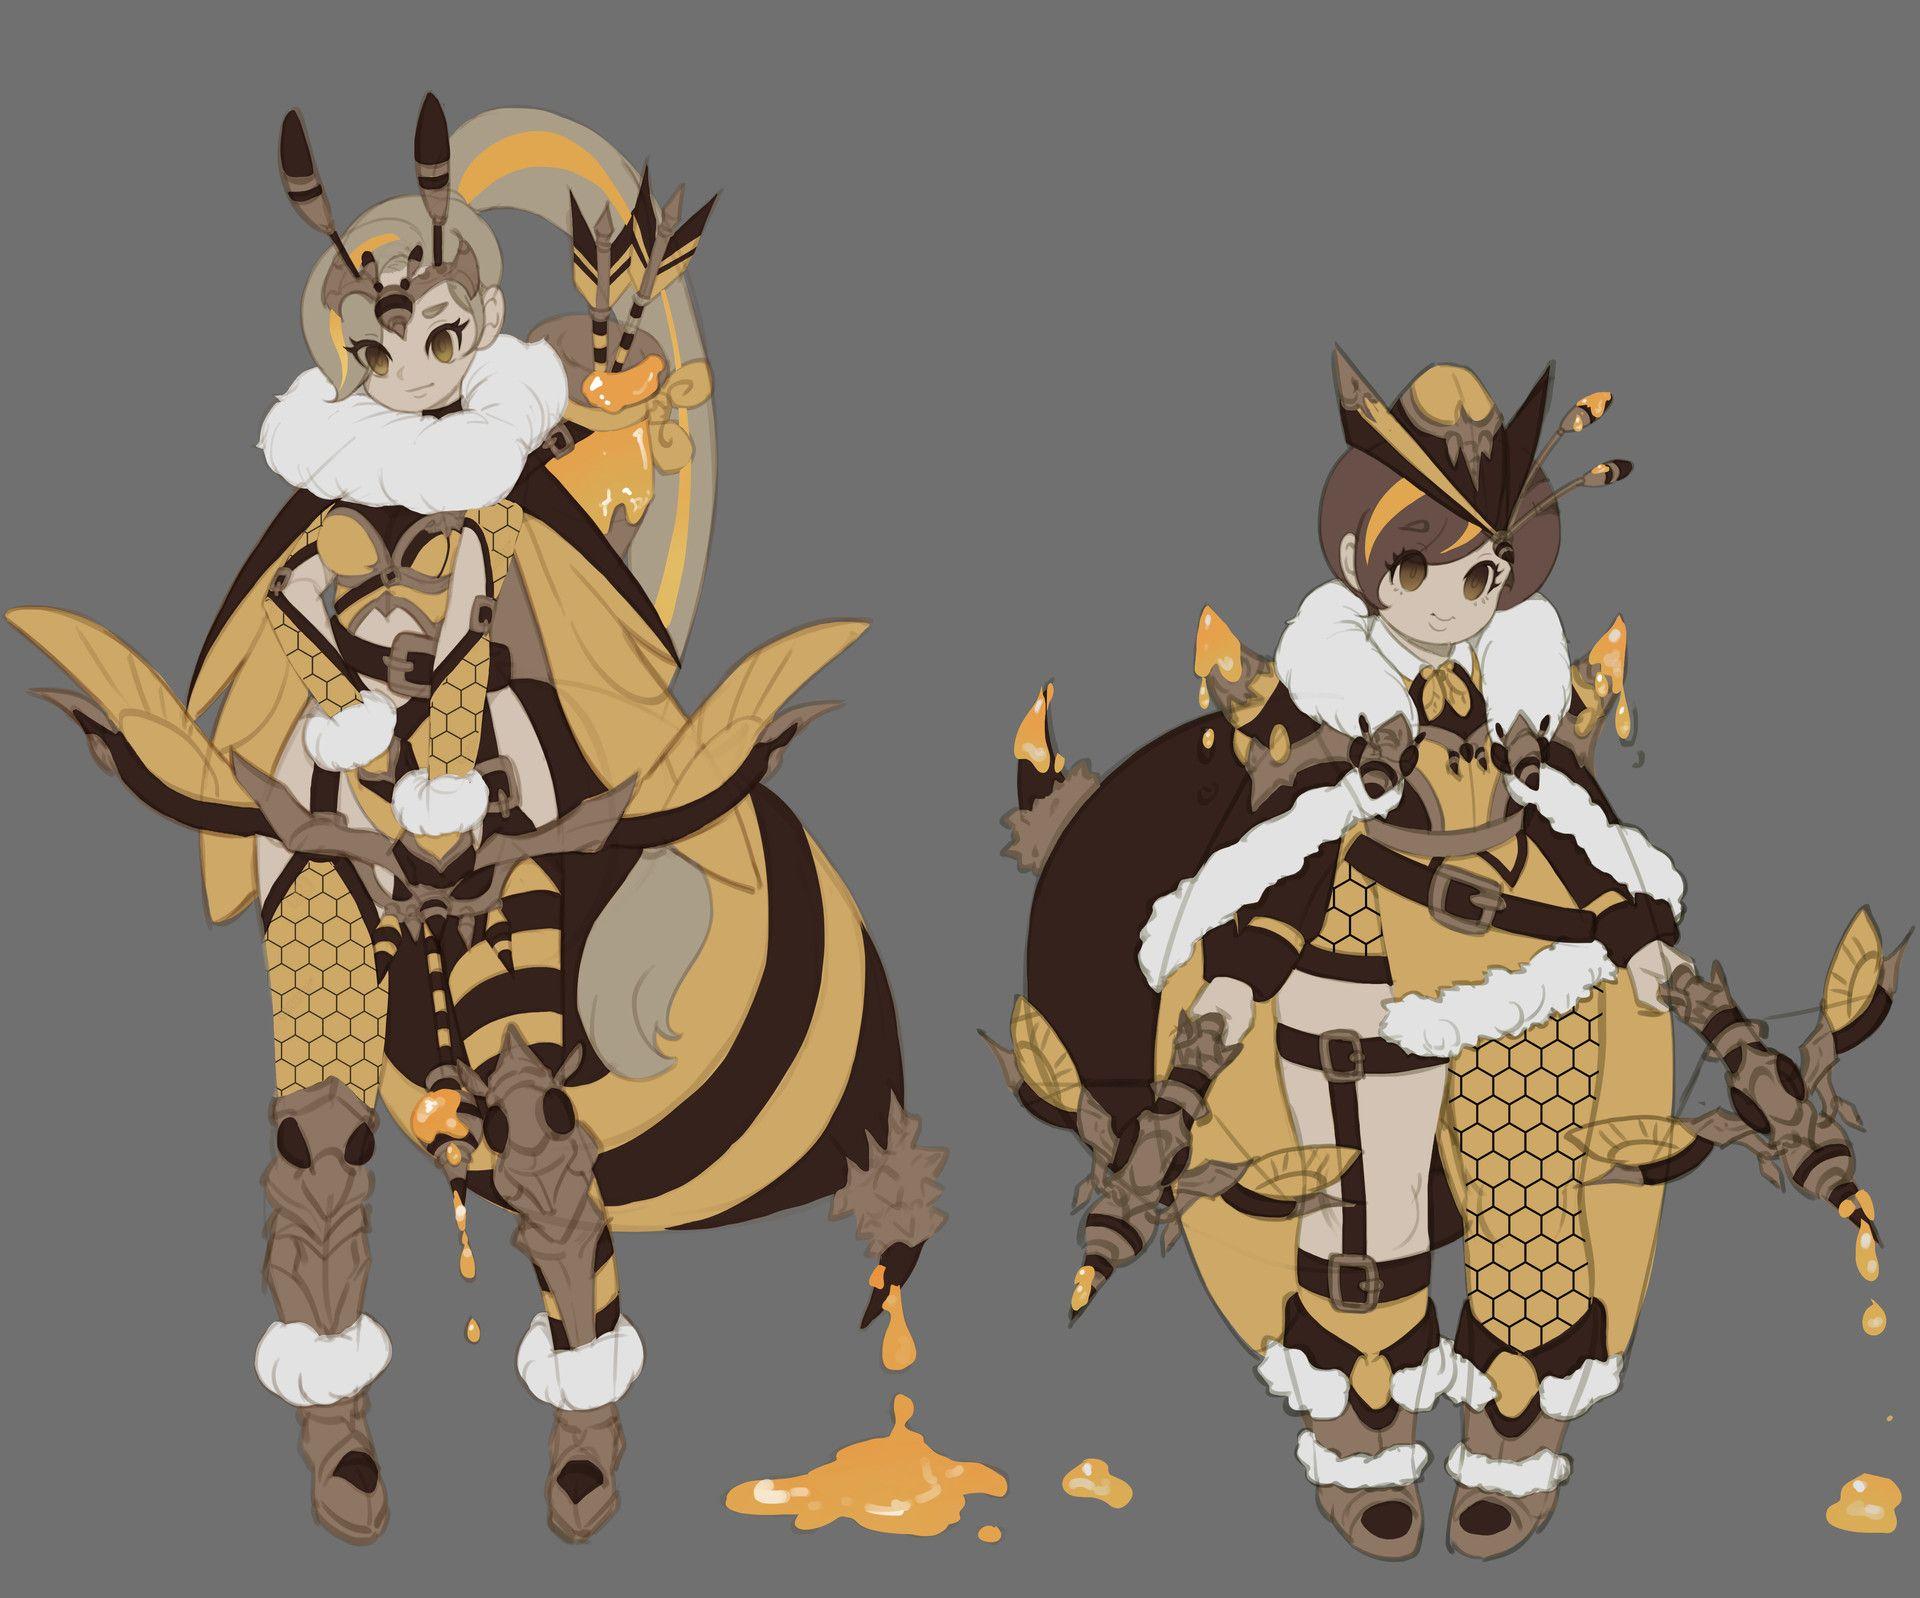 ArtStation Honey flight, Shasha . Character design